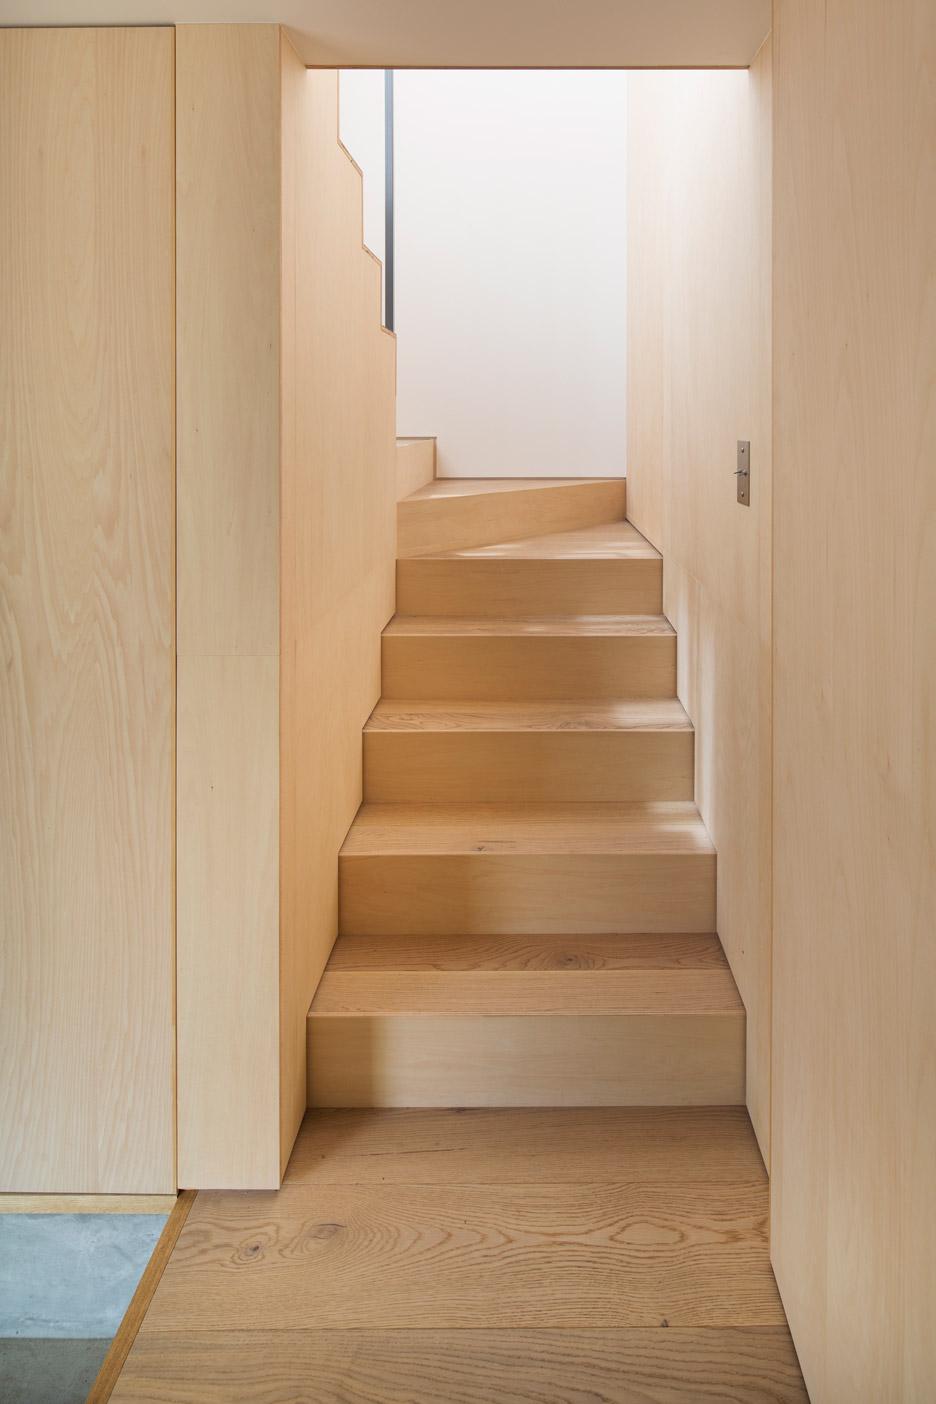 module-grid-house-tetsuo-yamaji-architects-kanto-japan_dezeen_936_5